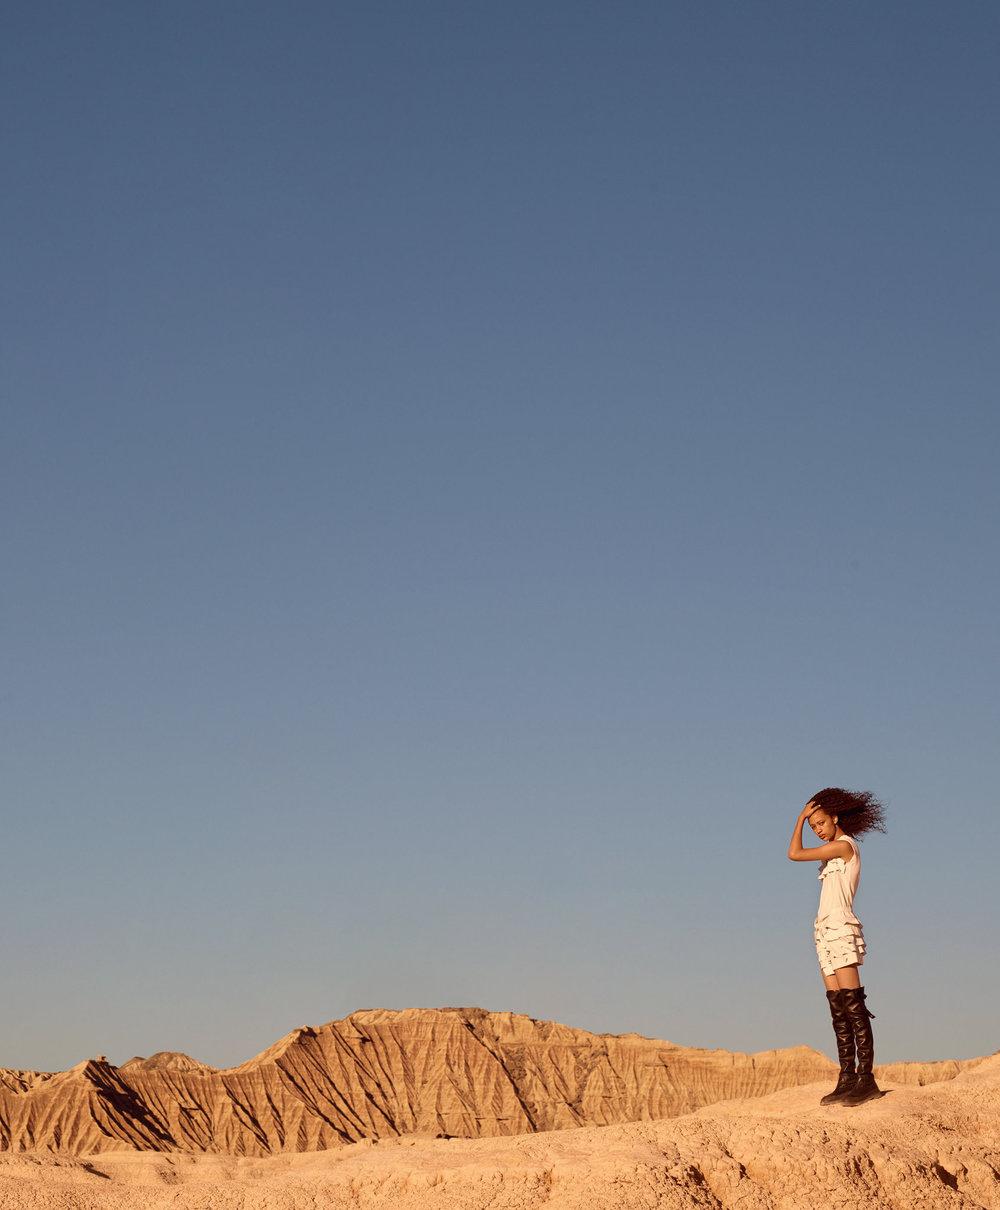 SELENA-FORREST-AND-LUISANA-GONZÁLEZ-BY-KARIM-SADLI-FOR-T-MAGAZINE-NOVEMBER-2016-1.jpg